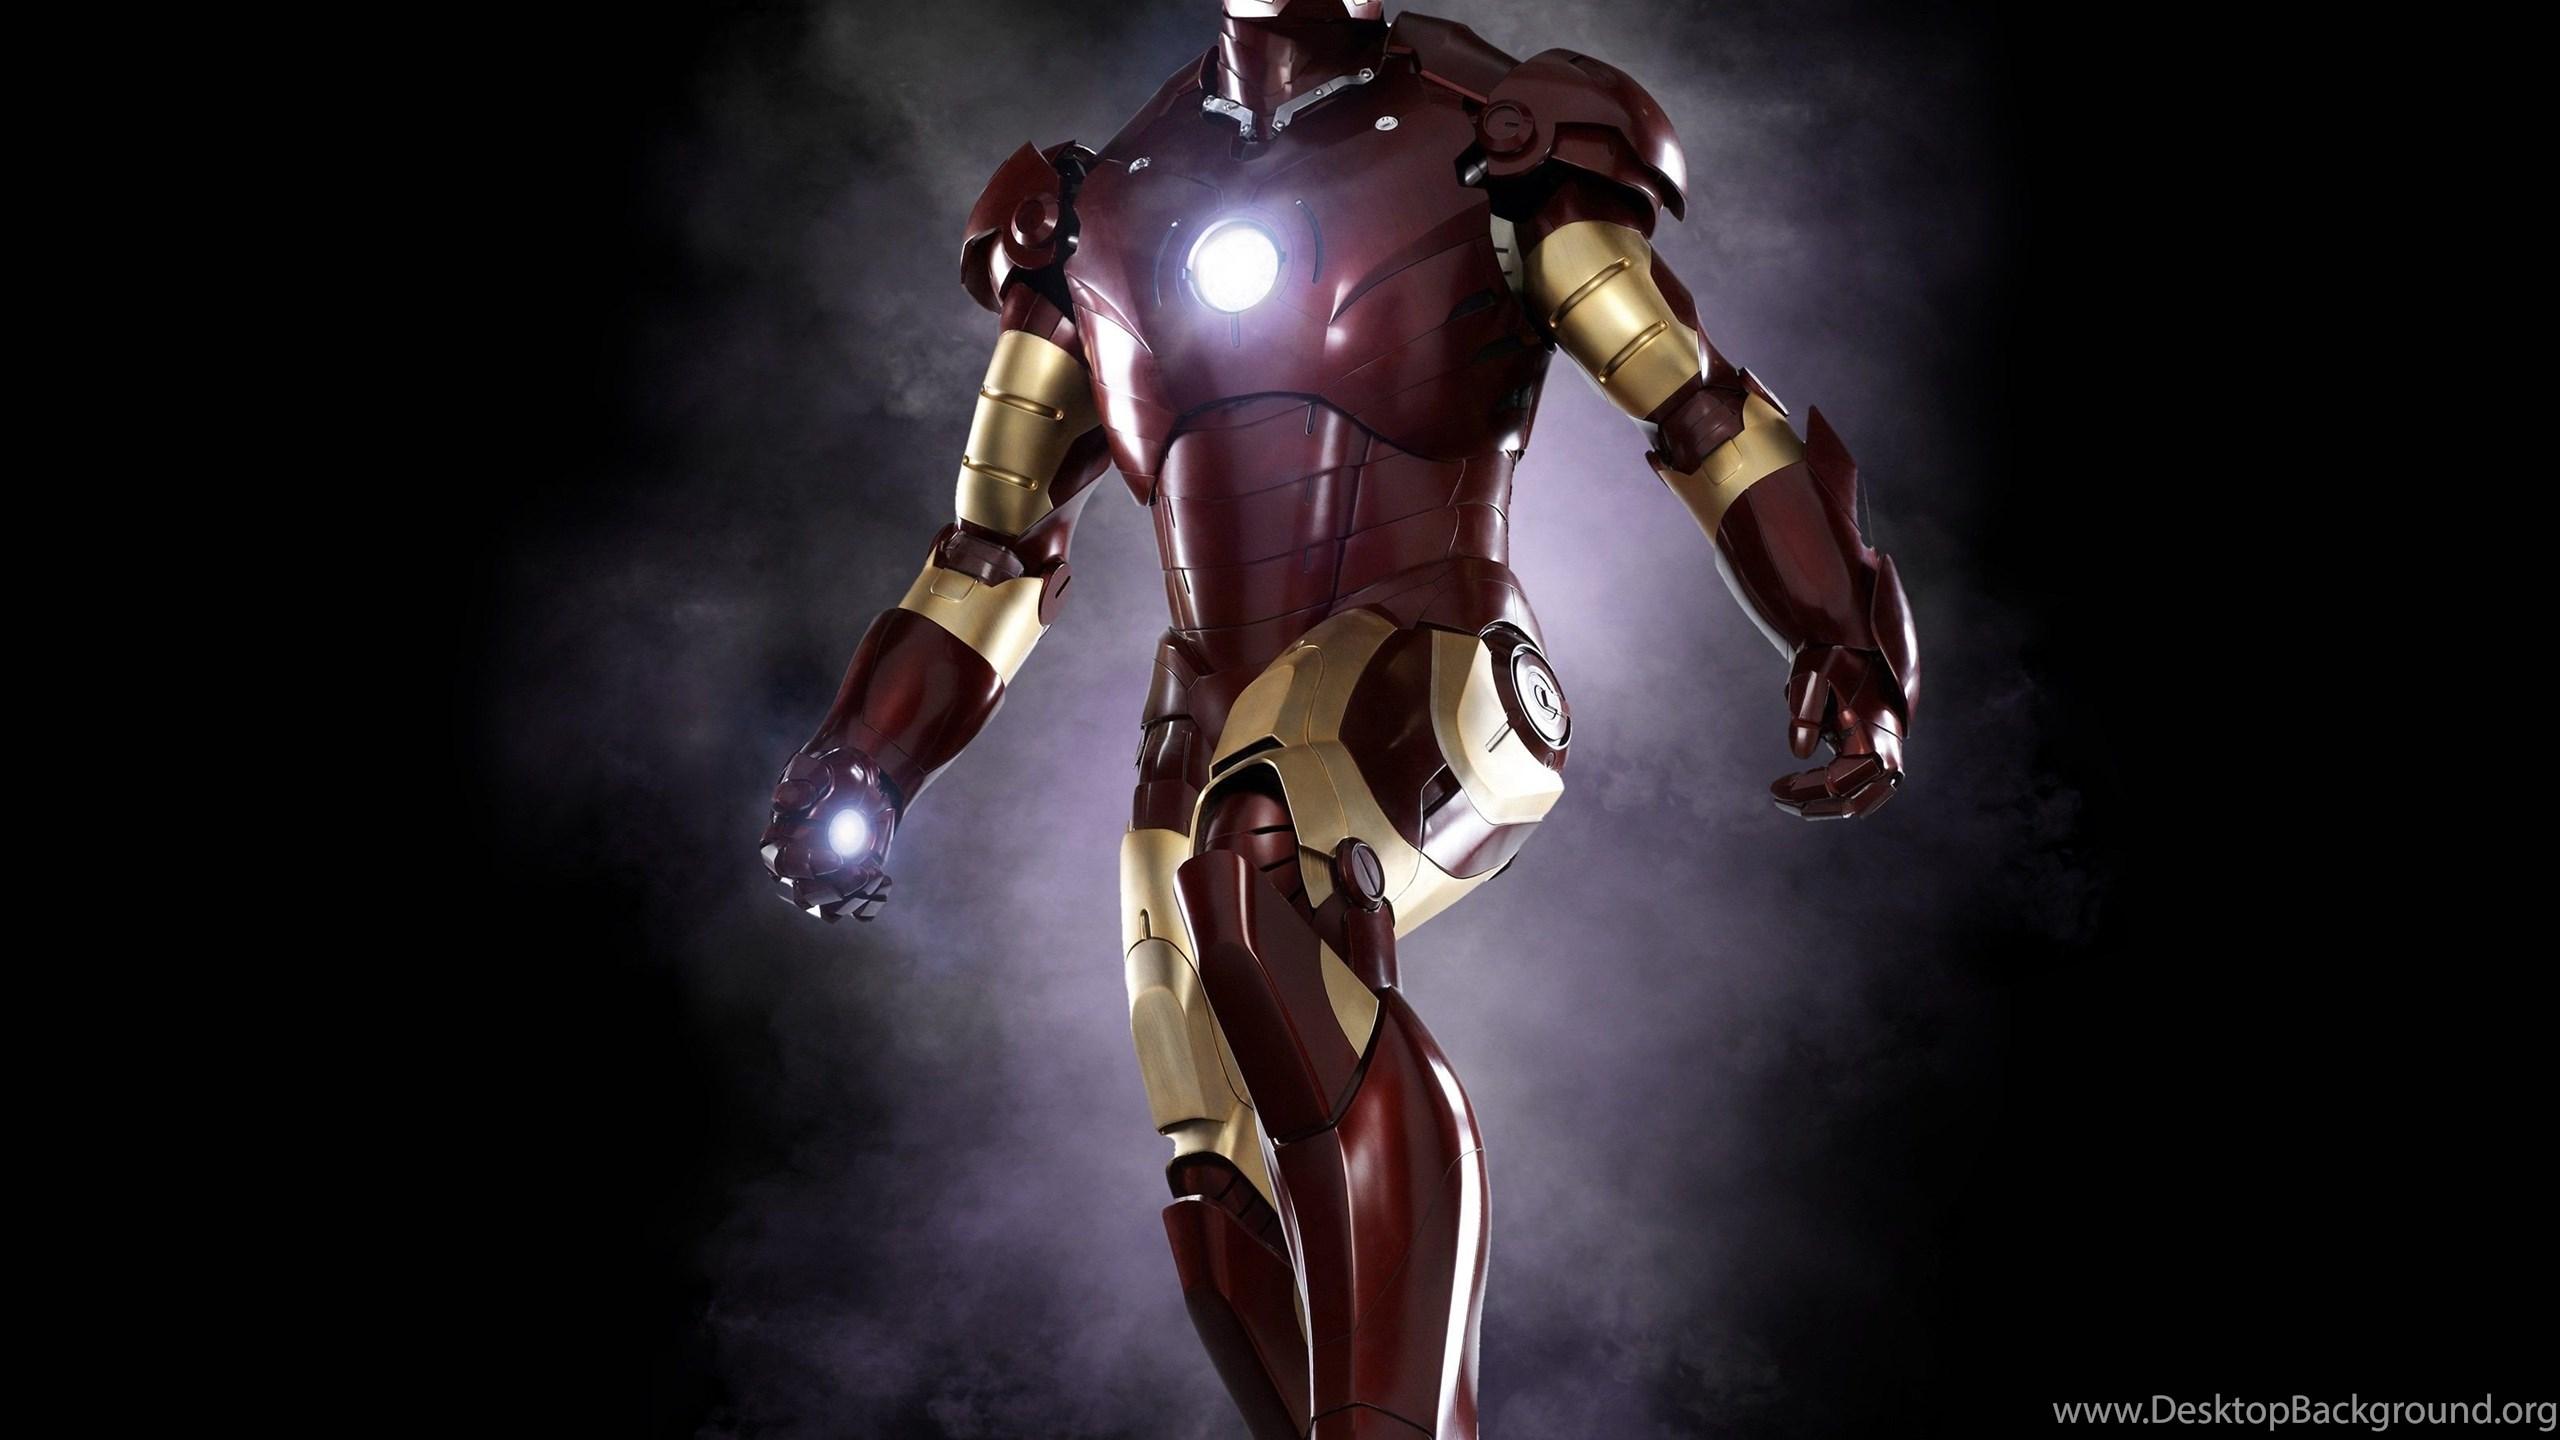 Cool Iron Man Hd Picture Hd Wallpapers Ironman 3d Desktop